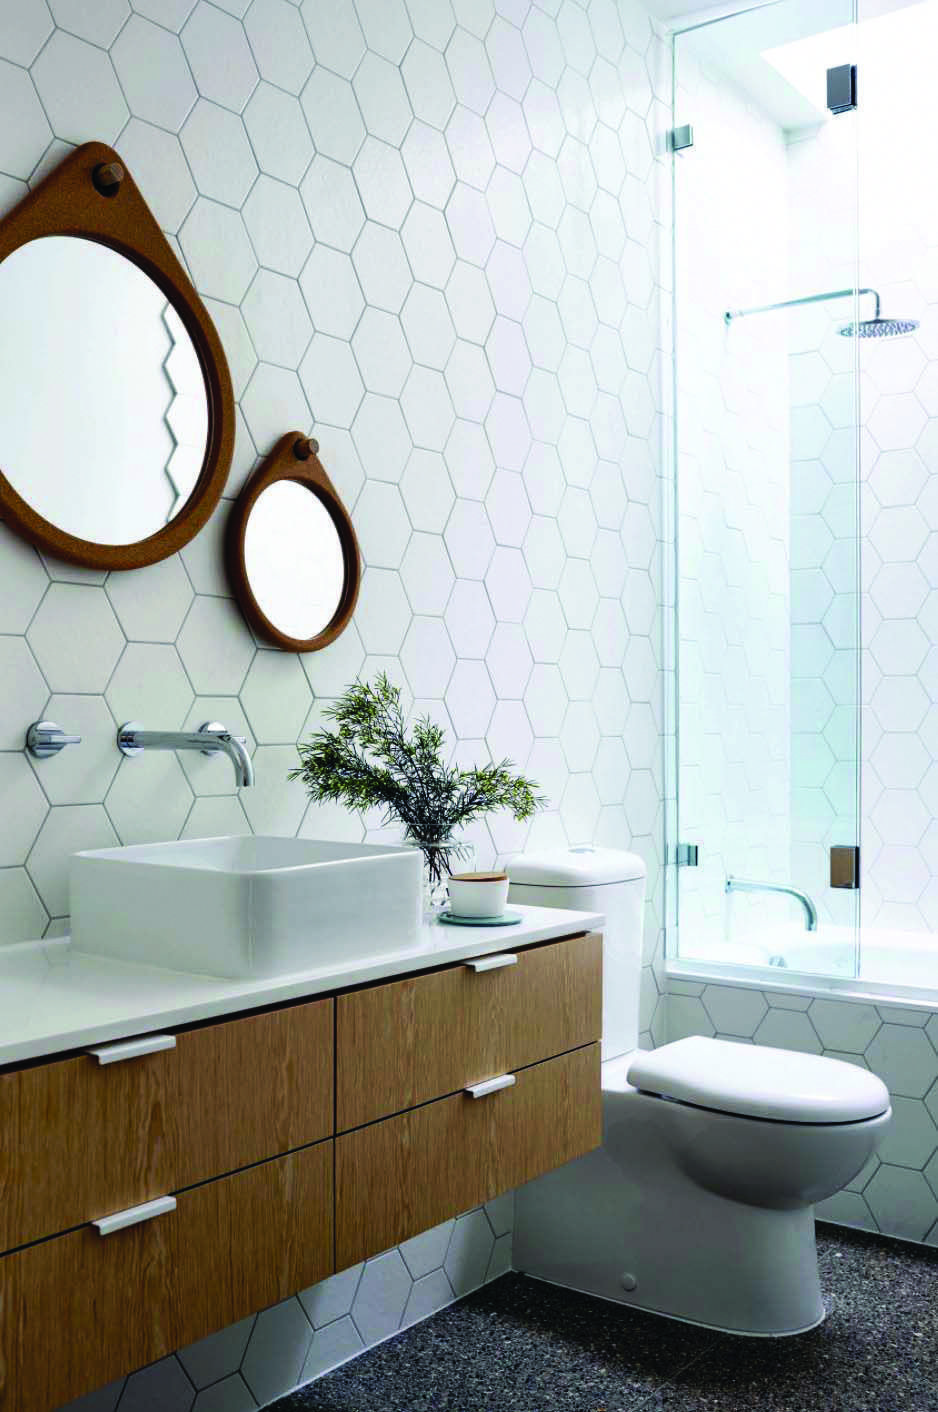 Bathroom Ideas Hamptons Amazing Modern Bathroom Ideas Uk One And Only Dovahome Com Bathroomaccessoriest Modern Bathroom Top Bathroom Design Bathroom Mirror Bathroom design ideas uk